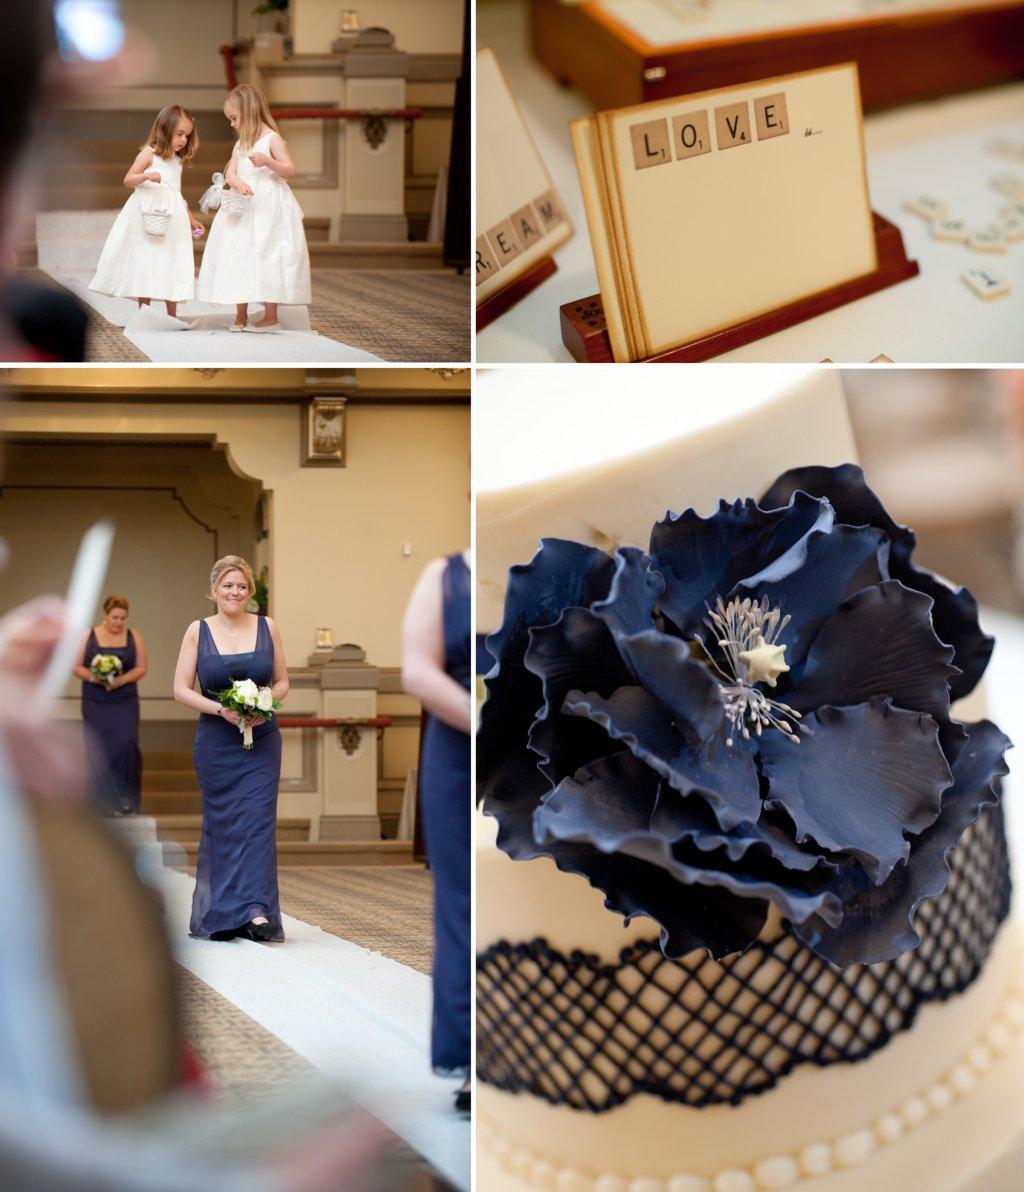 Elegant-real-wedding-inspiration-for-virginia-brides-scrabble-themed-decor.full